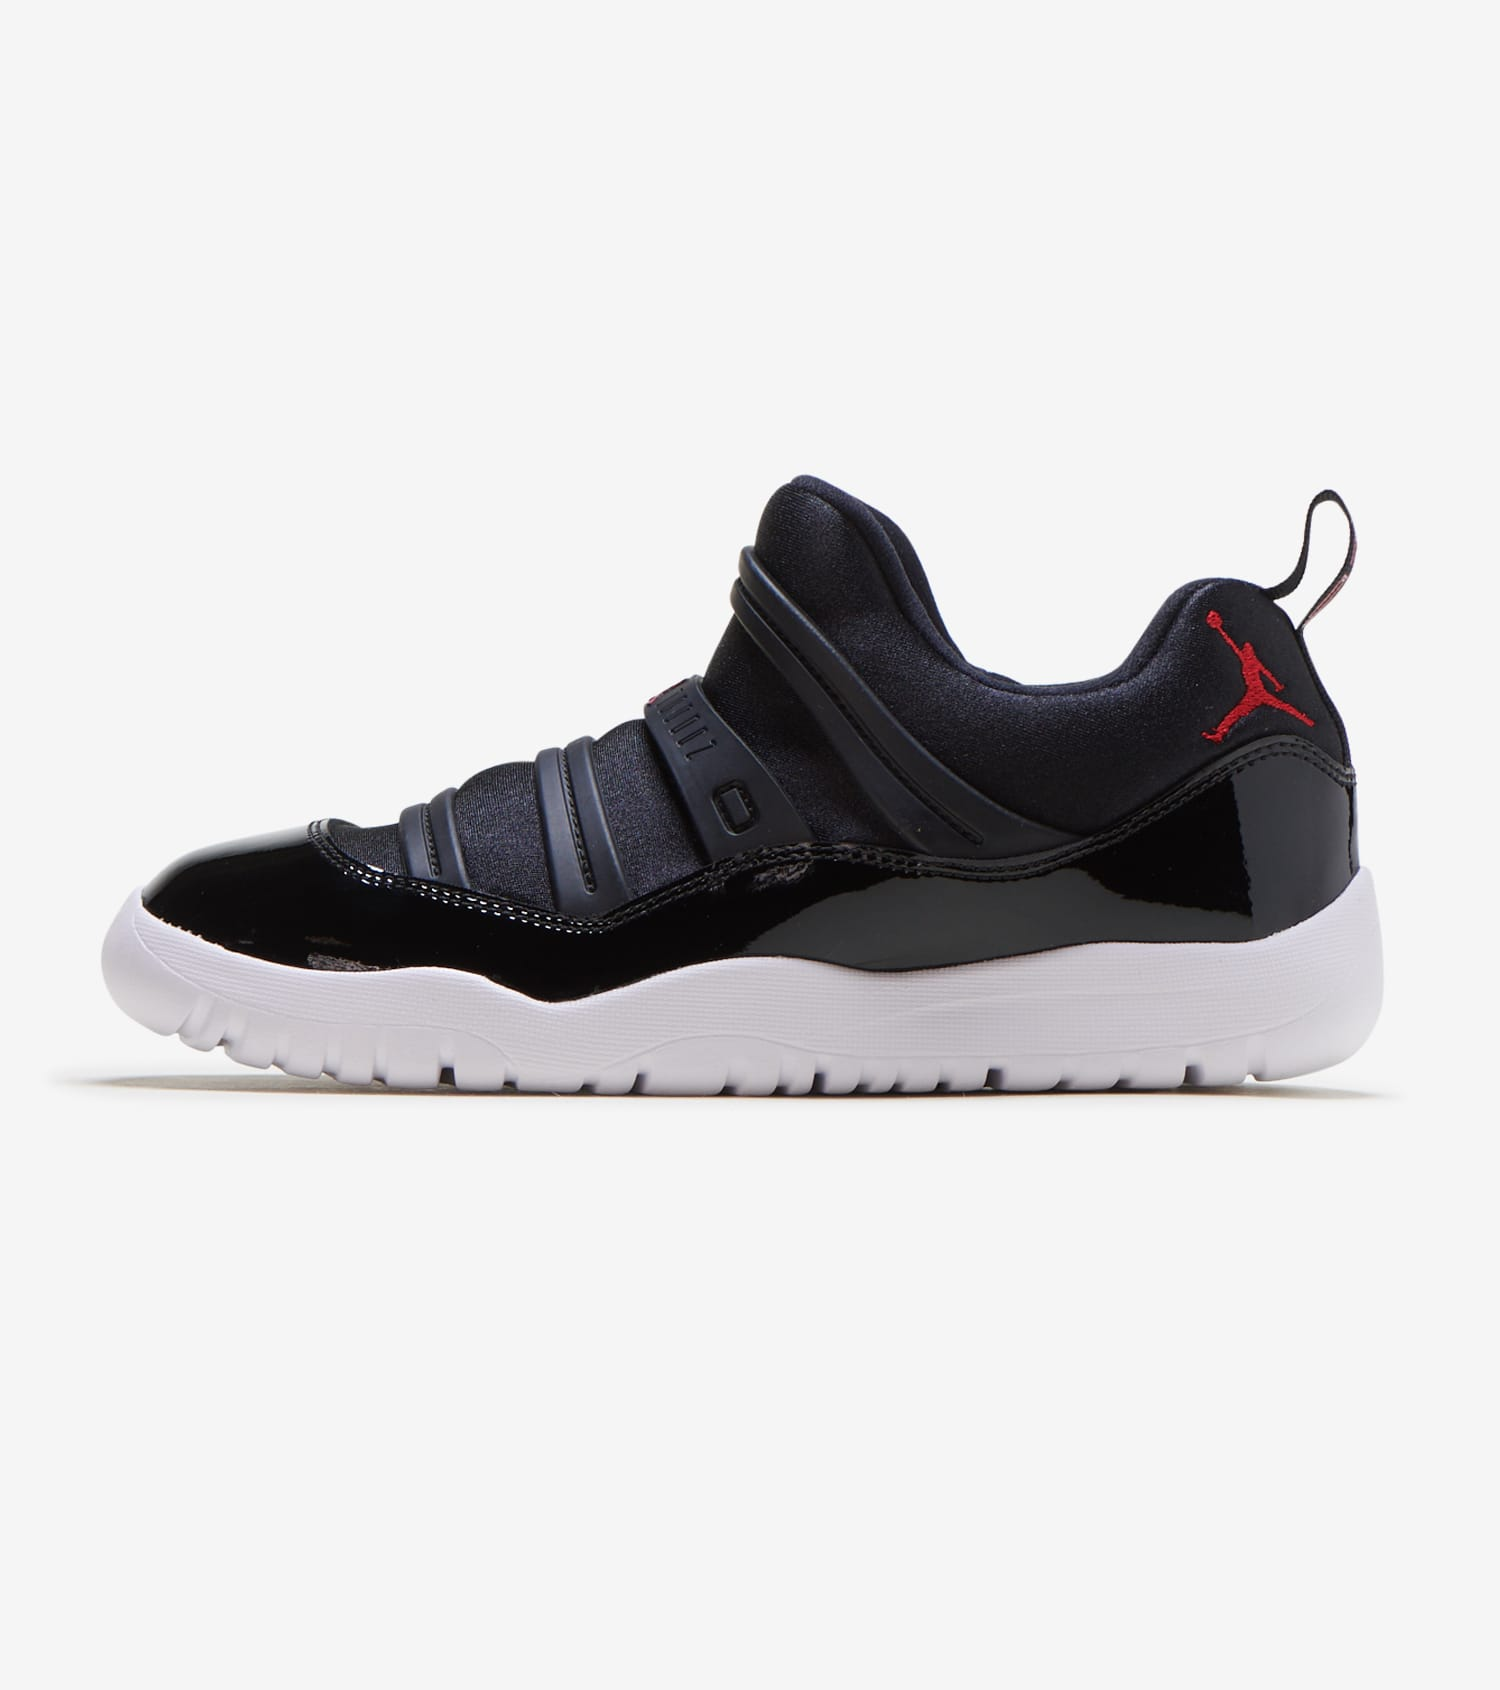 buy popular ac395 2f930 Jordan Retro 11 Little Flex (Black) - BQ7101-002 | Jimmy Jazz